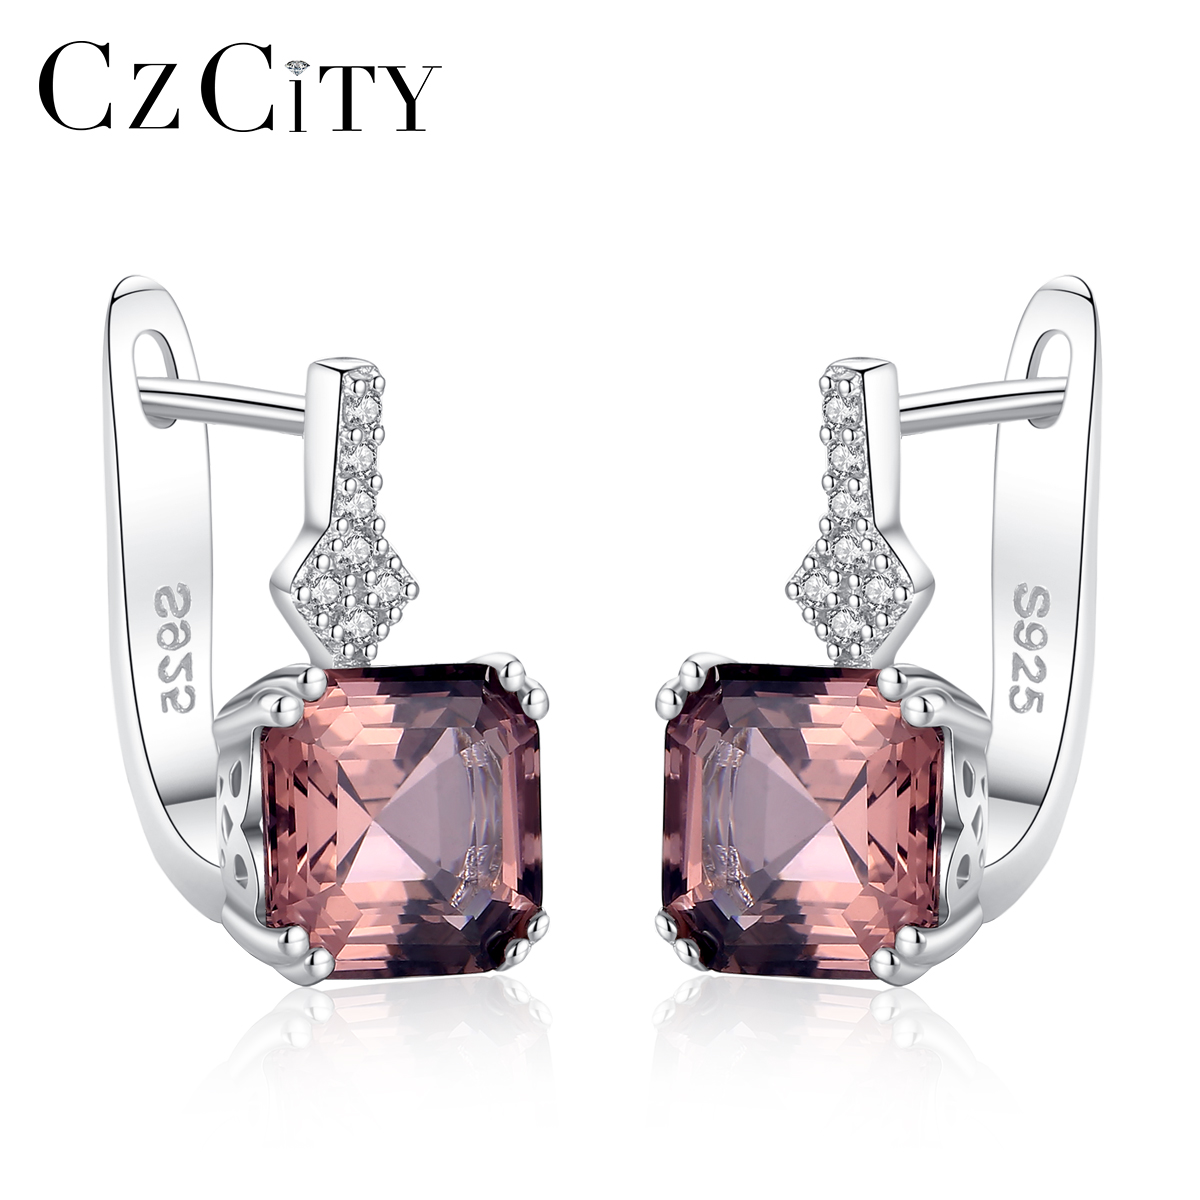 CZCITY New Brand Created Nano Smoke /White Morgan Stone Gemstone Clip On Earrings For Women Luxury 925 Silver Cuff Earring Gifts